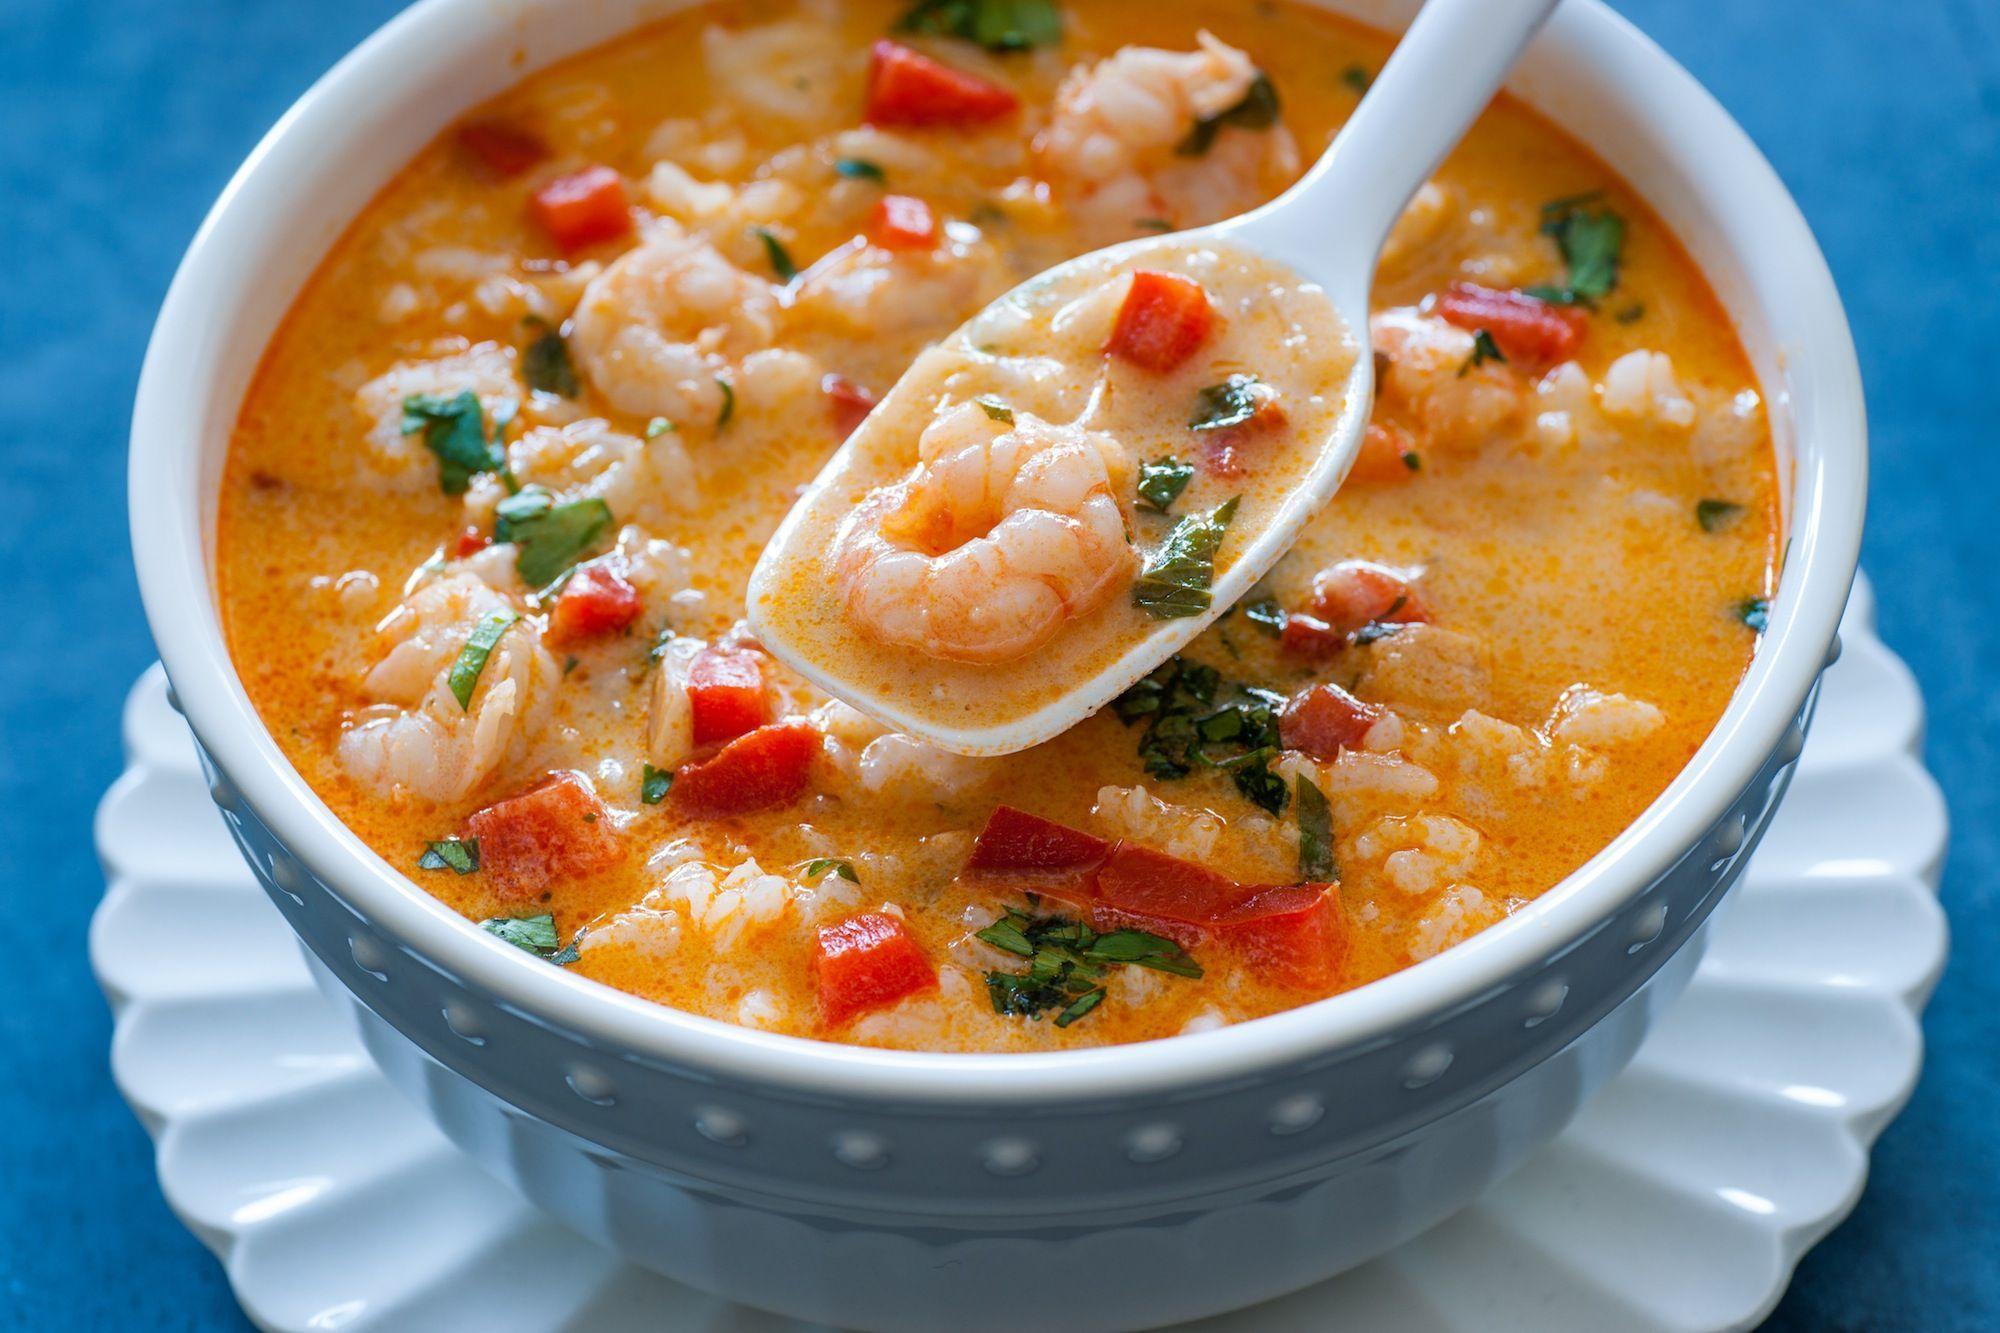 Thai shrimp coconut curry recipe shrimp curry thai shrimp and curry shrimp curry recipe thai food forumfinder Image collections